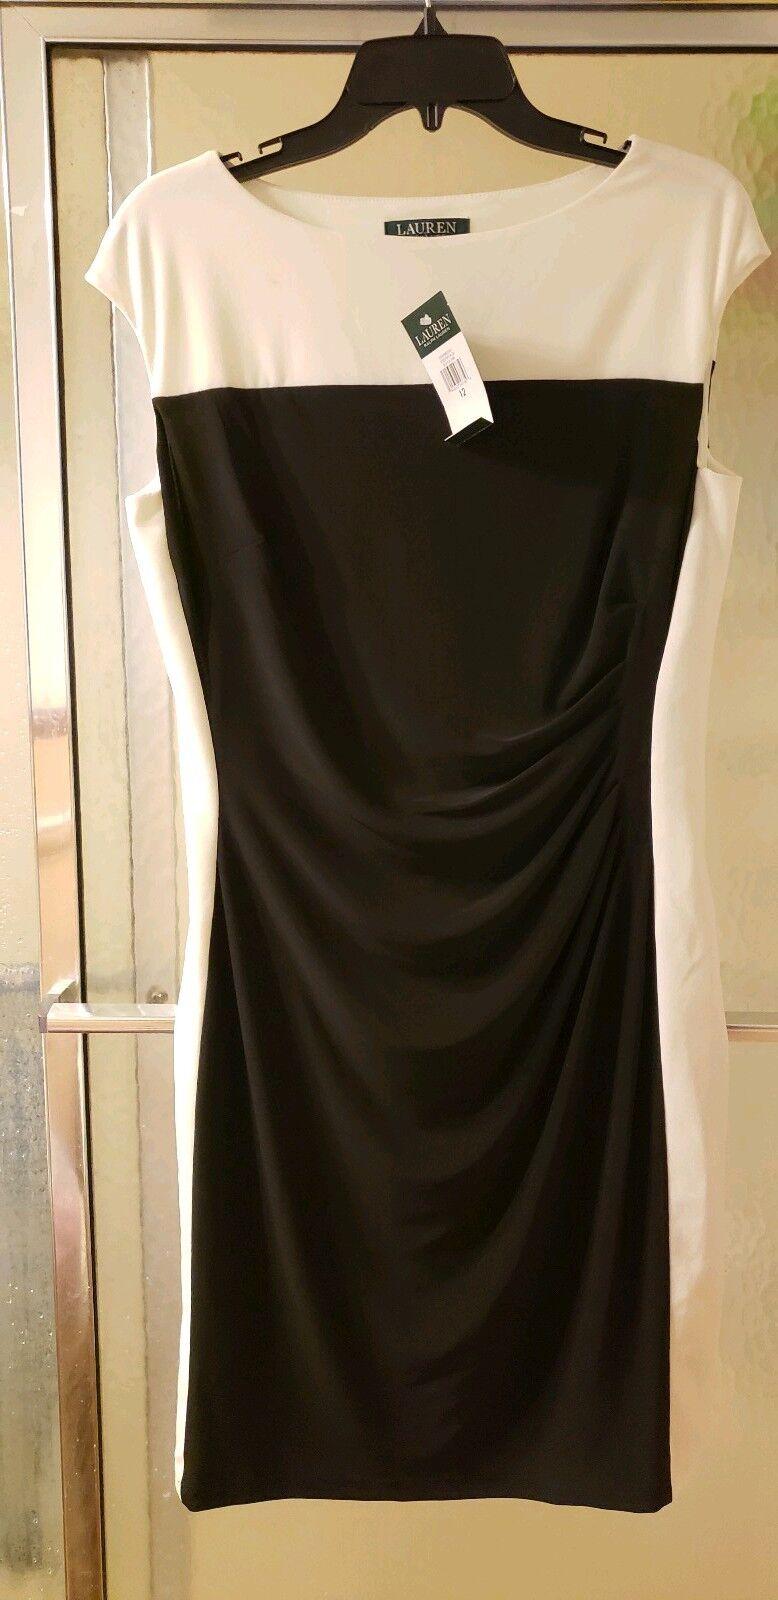 NWT Ralph Lauren Essentials; Cream & White color; Sz 12; Cap Sleeves;  80